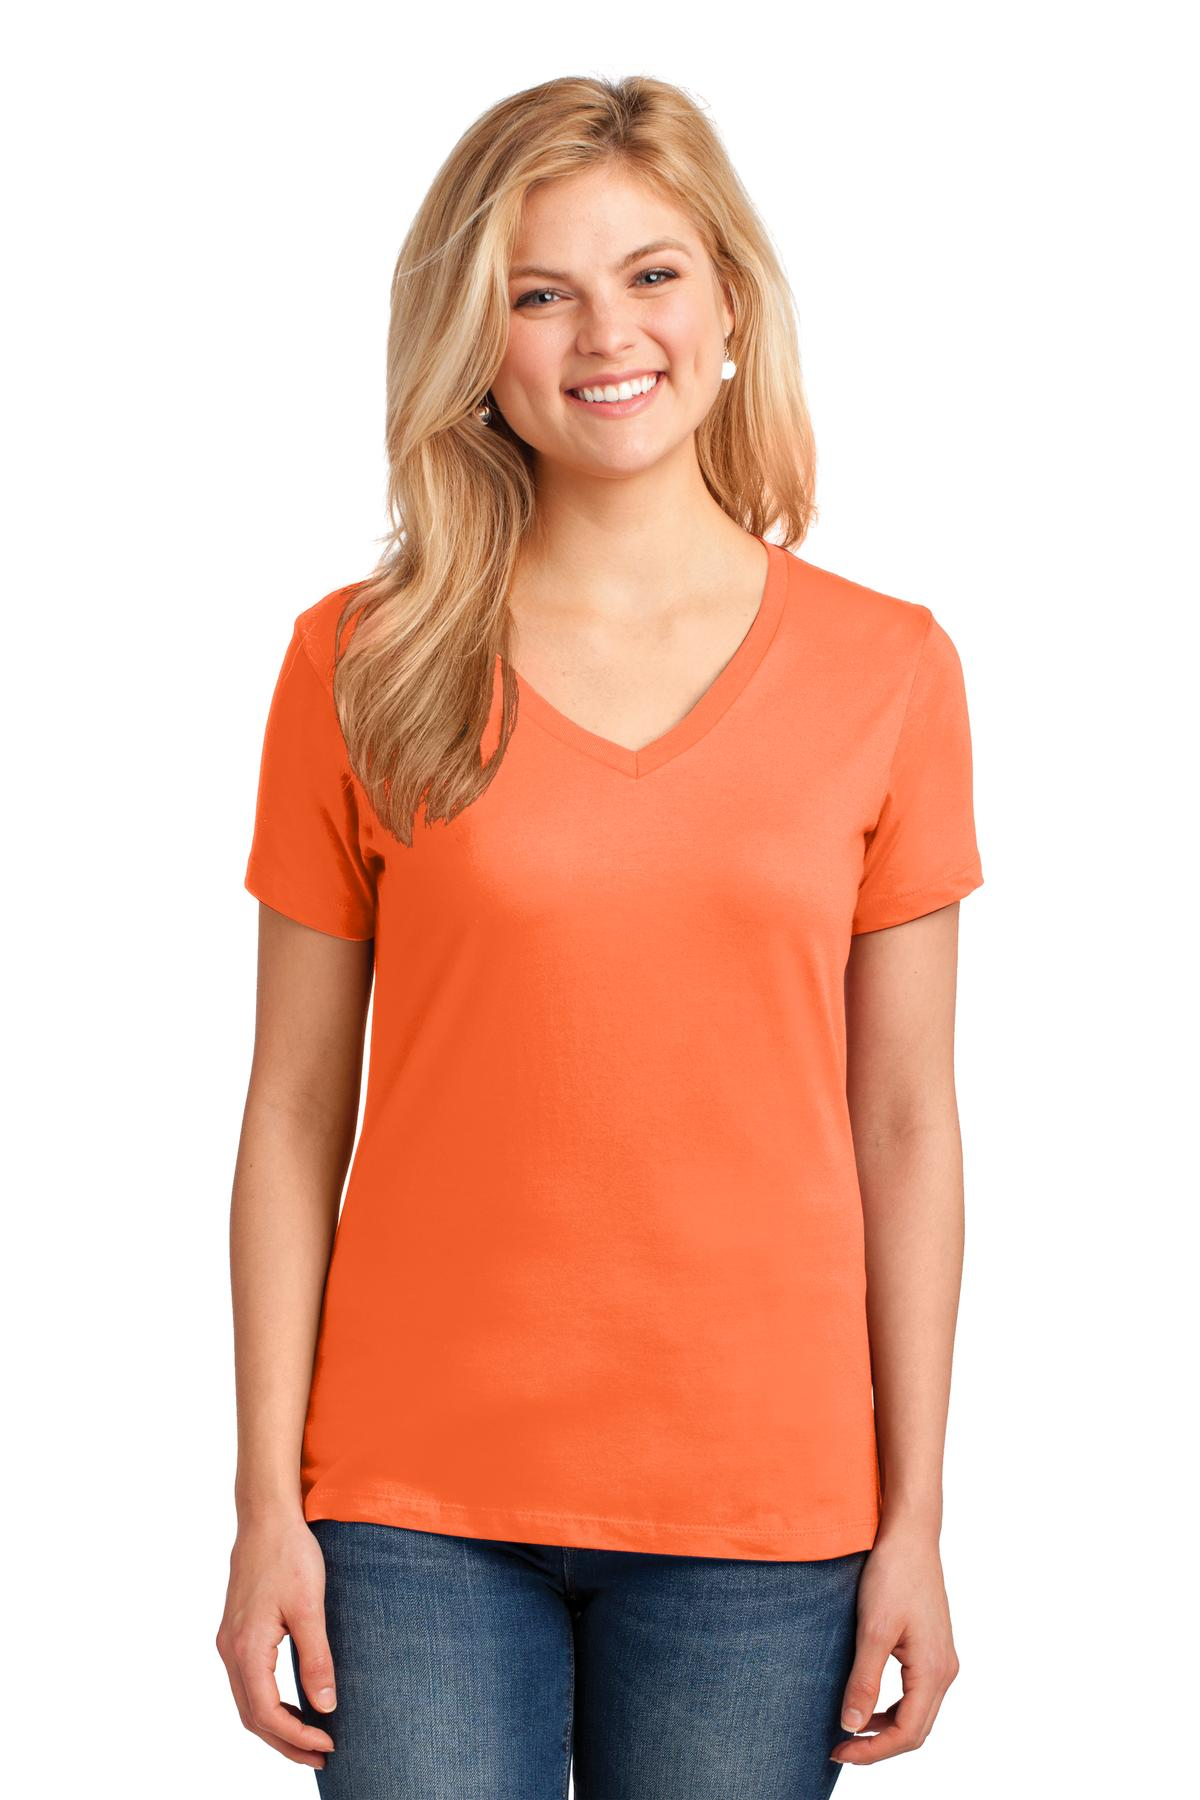 T-Shirts-100-Cotton-81